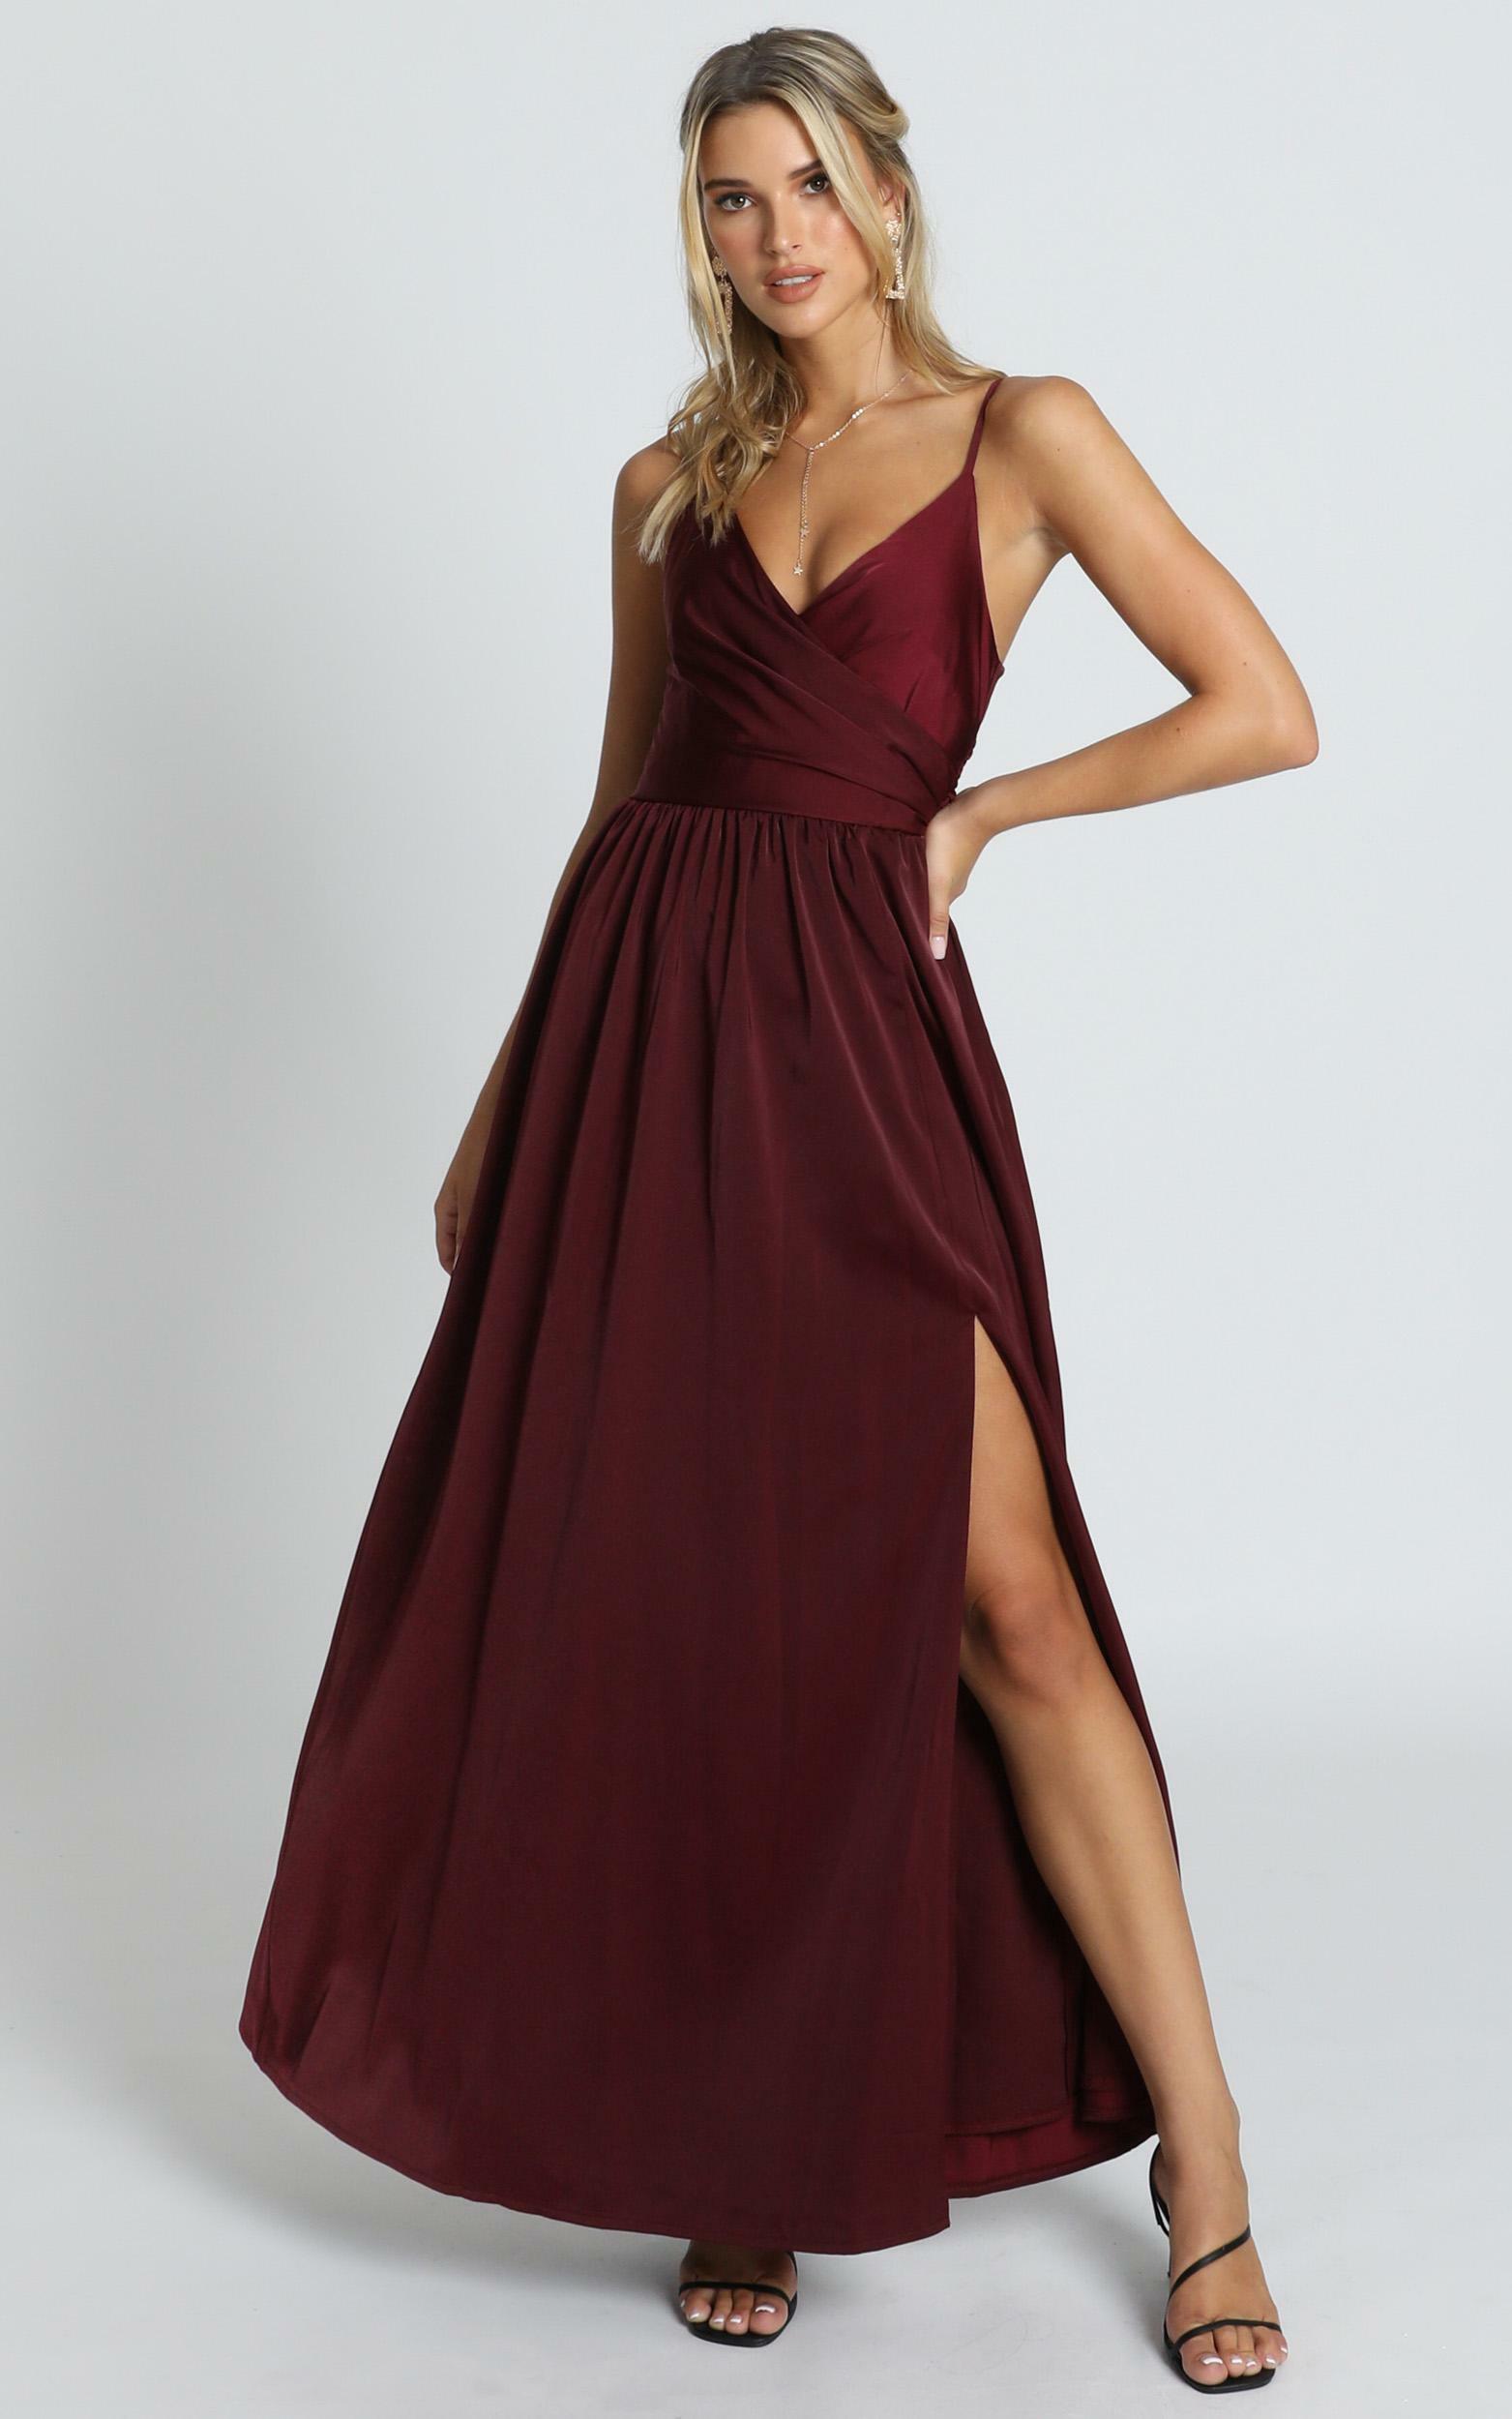 Revolve Around Me Dress in wine - 20 (XXXXL), Wine, hi-res image number null